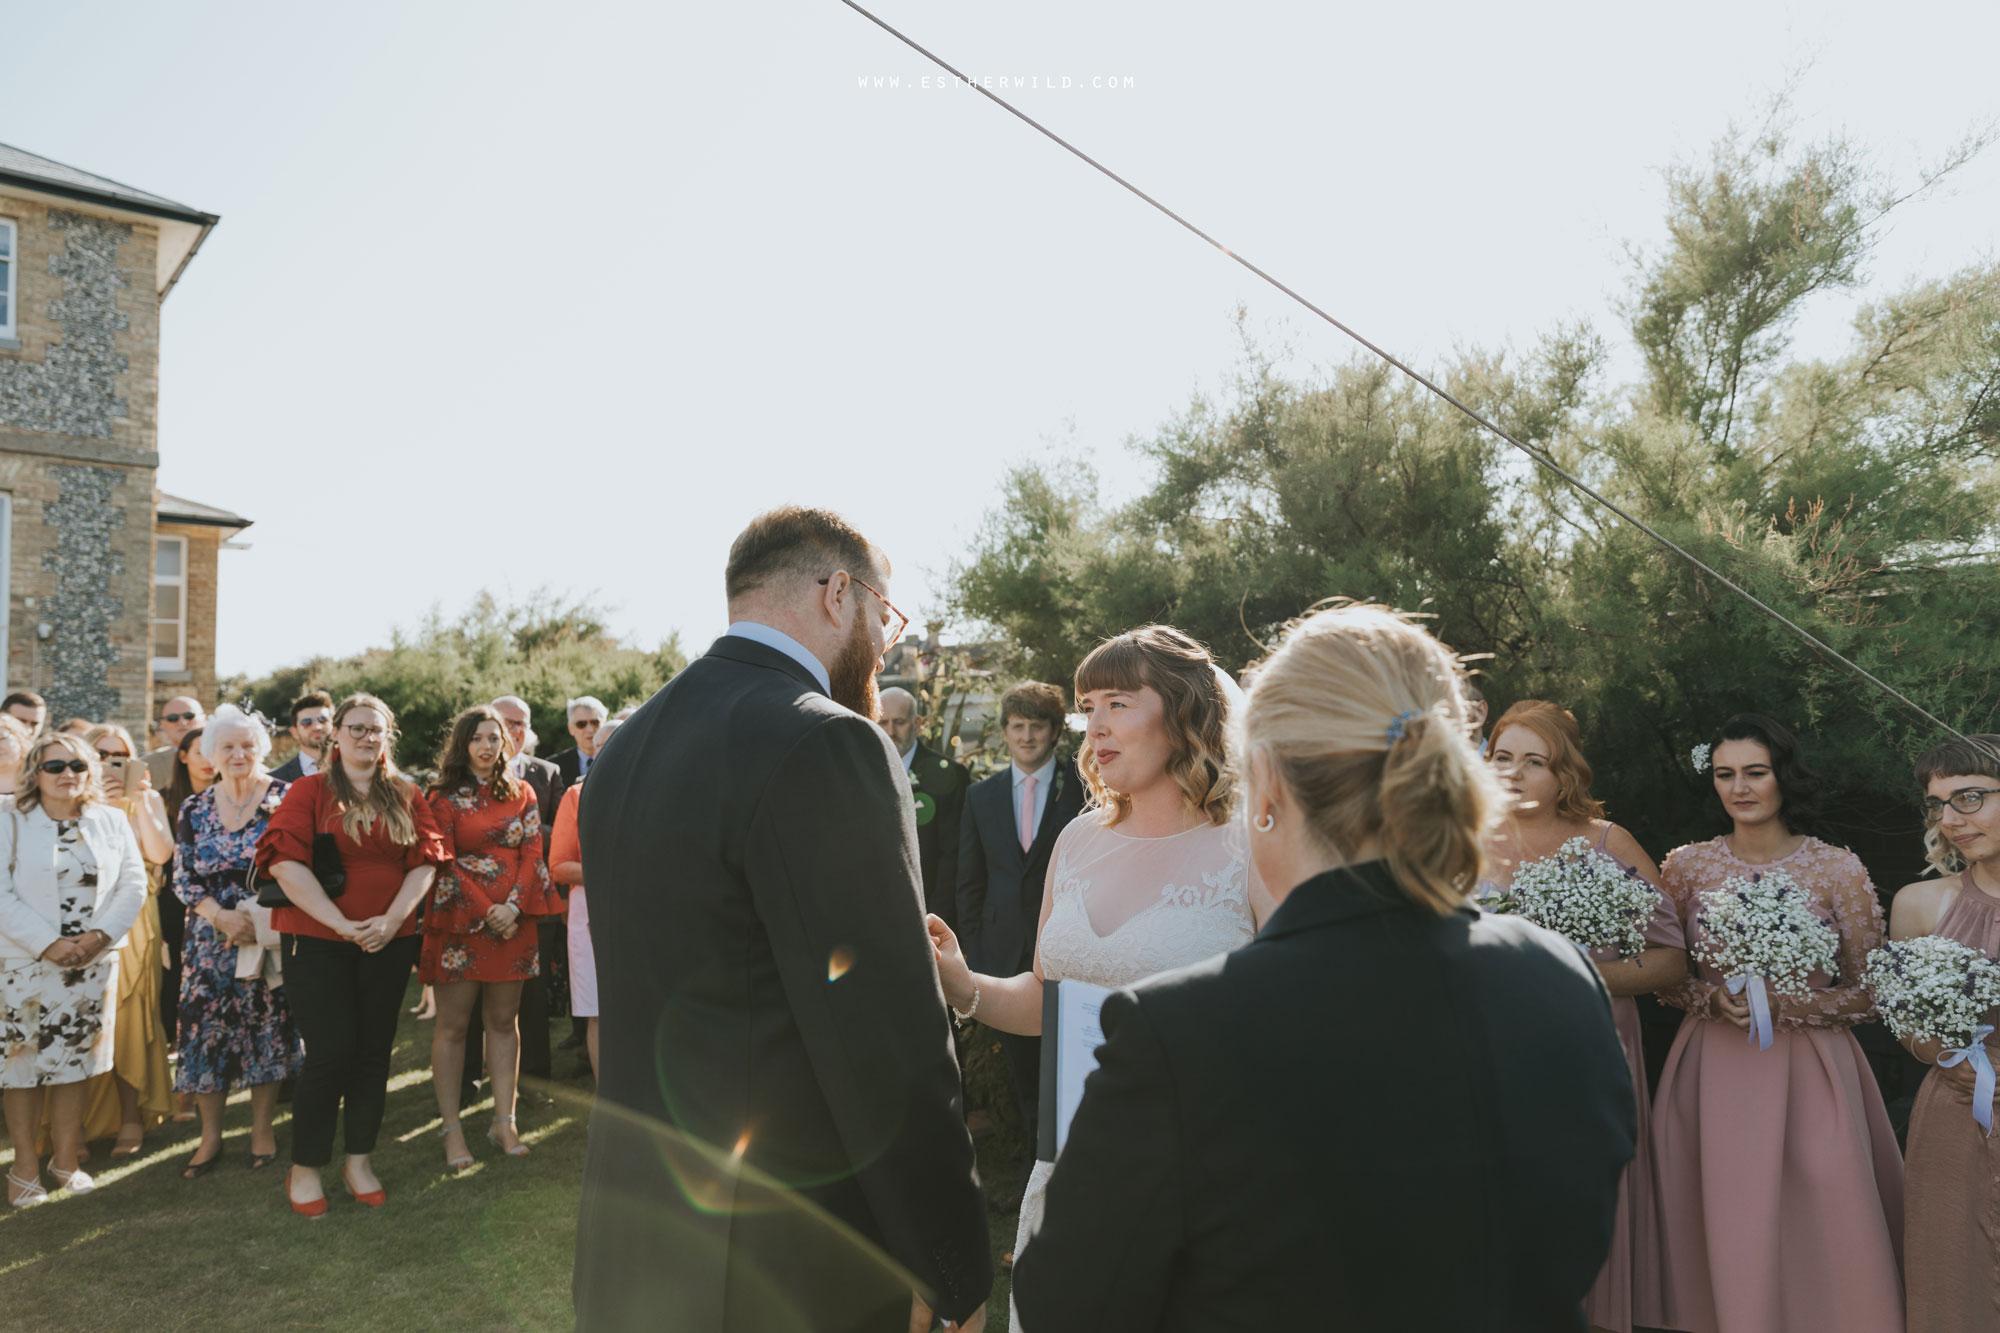 Cromer_Wedding_Beach_Outdoor_Ceremony_Norfolk_North_Lodge_Registry_Office_Rocket_House_Cafe_Cromer_Pier_IMG_3830.jpg